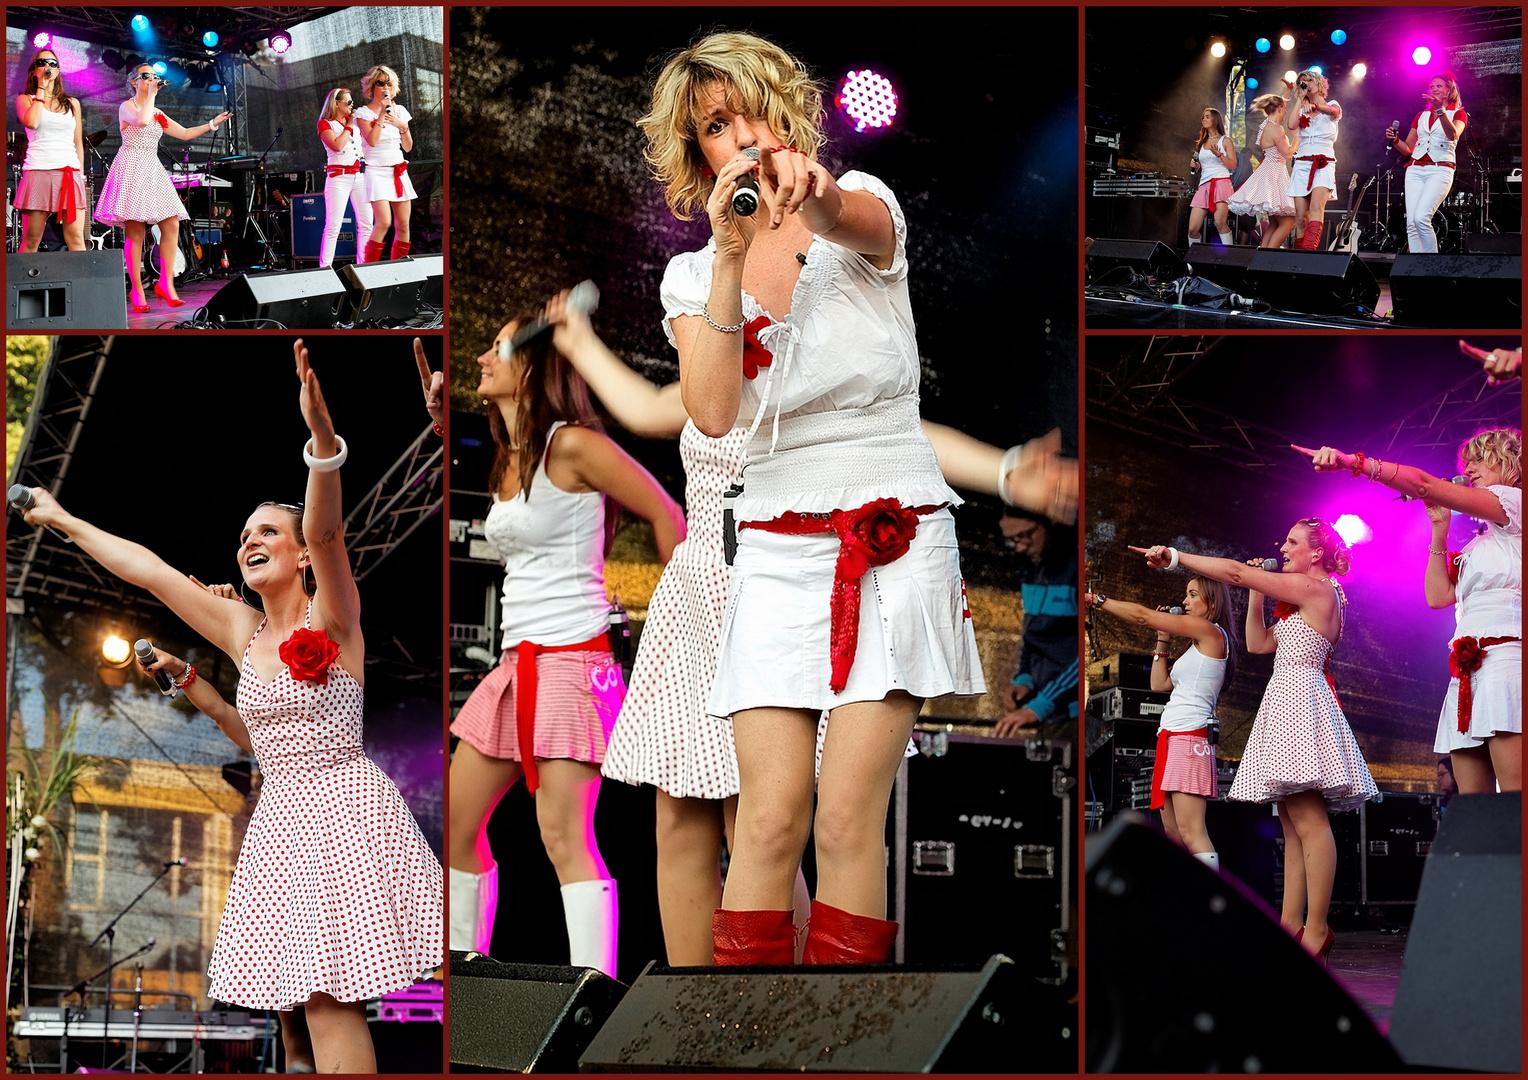 cölln girls - im Kurpark Bad Neuenahr 2011